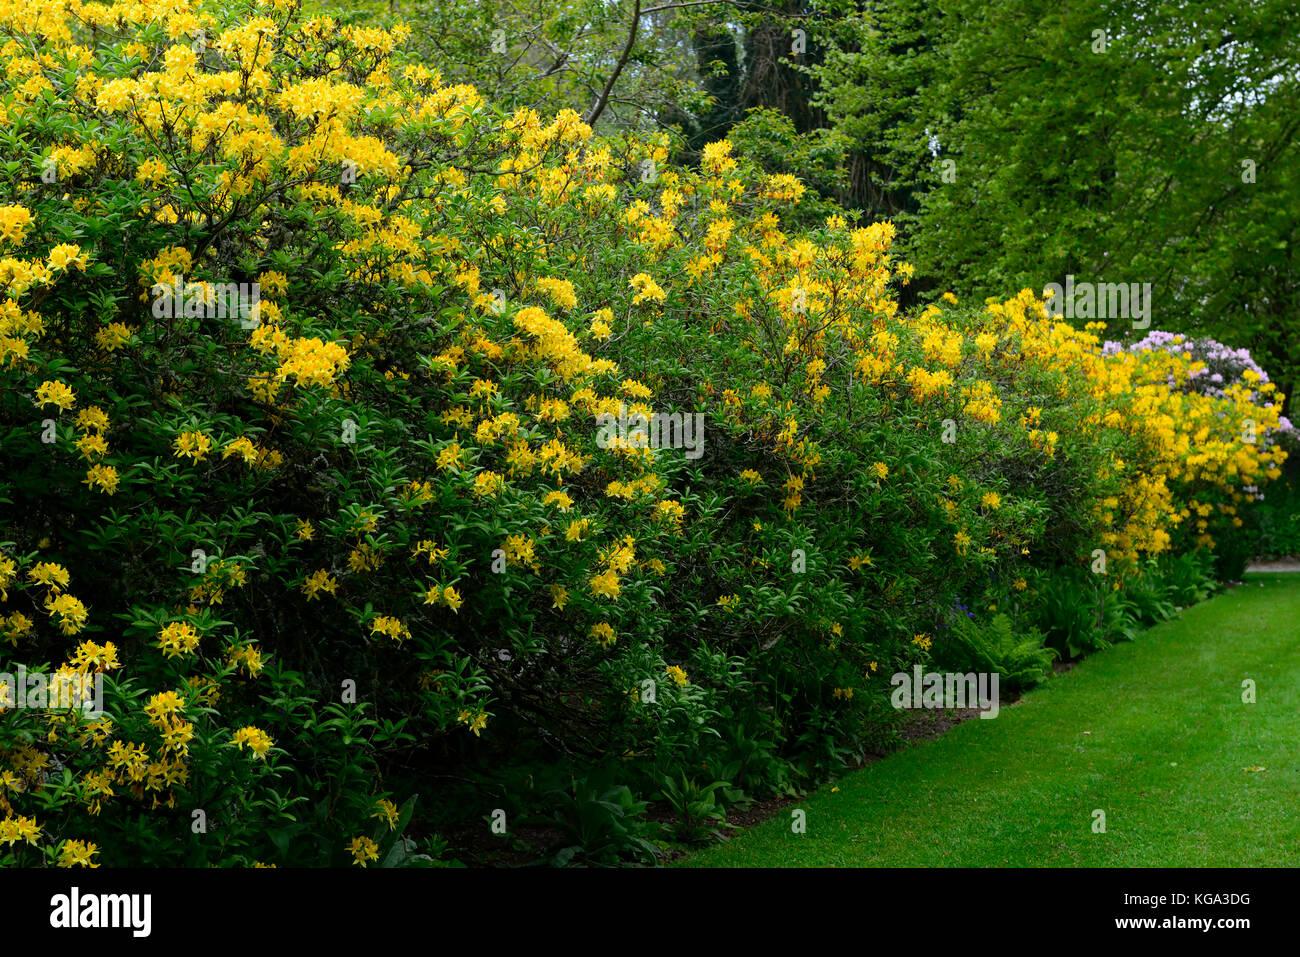 Arbusto Dai Fiori Gialli.Azalea Pontica Immagini Azalea Pontica Fotos Stock Alamy